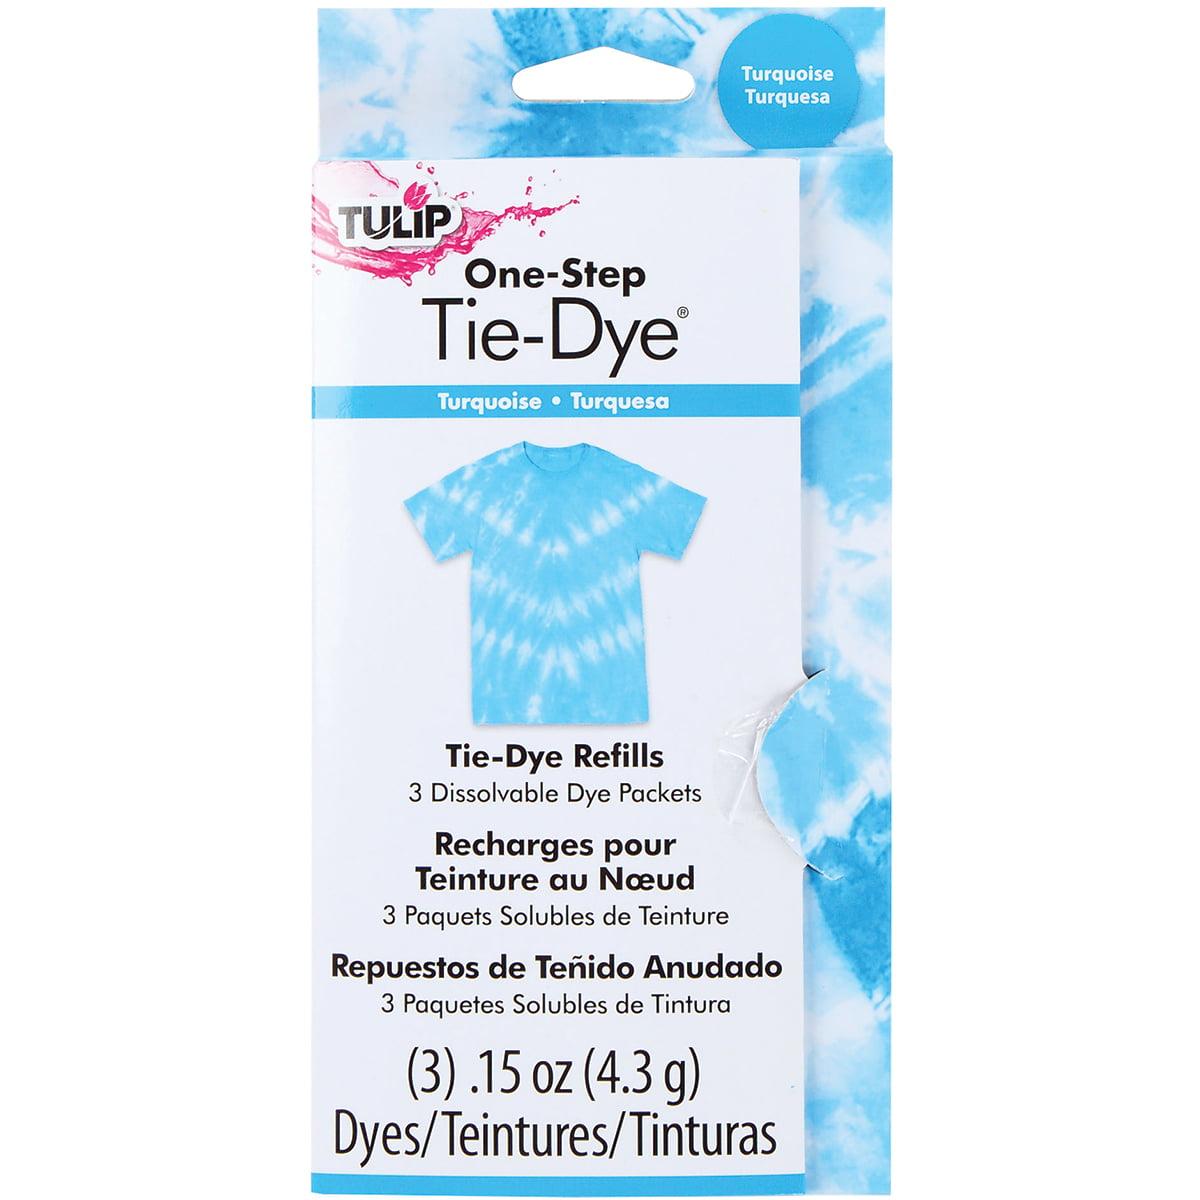 0fc354f34e7c Tulip One Tie Dye Refill 13oz 3 Pkg Turquoise. Tulip Sup Tie Dye Paint  Refills